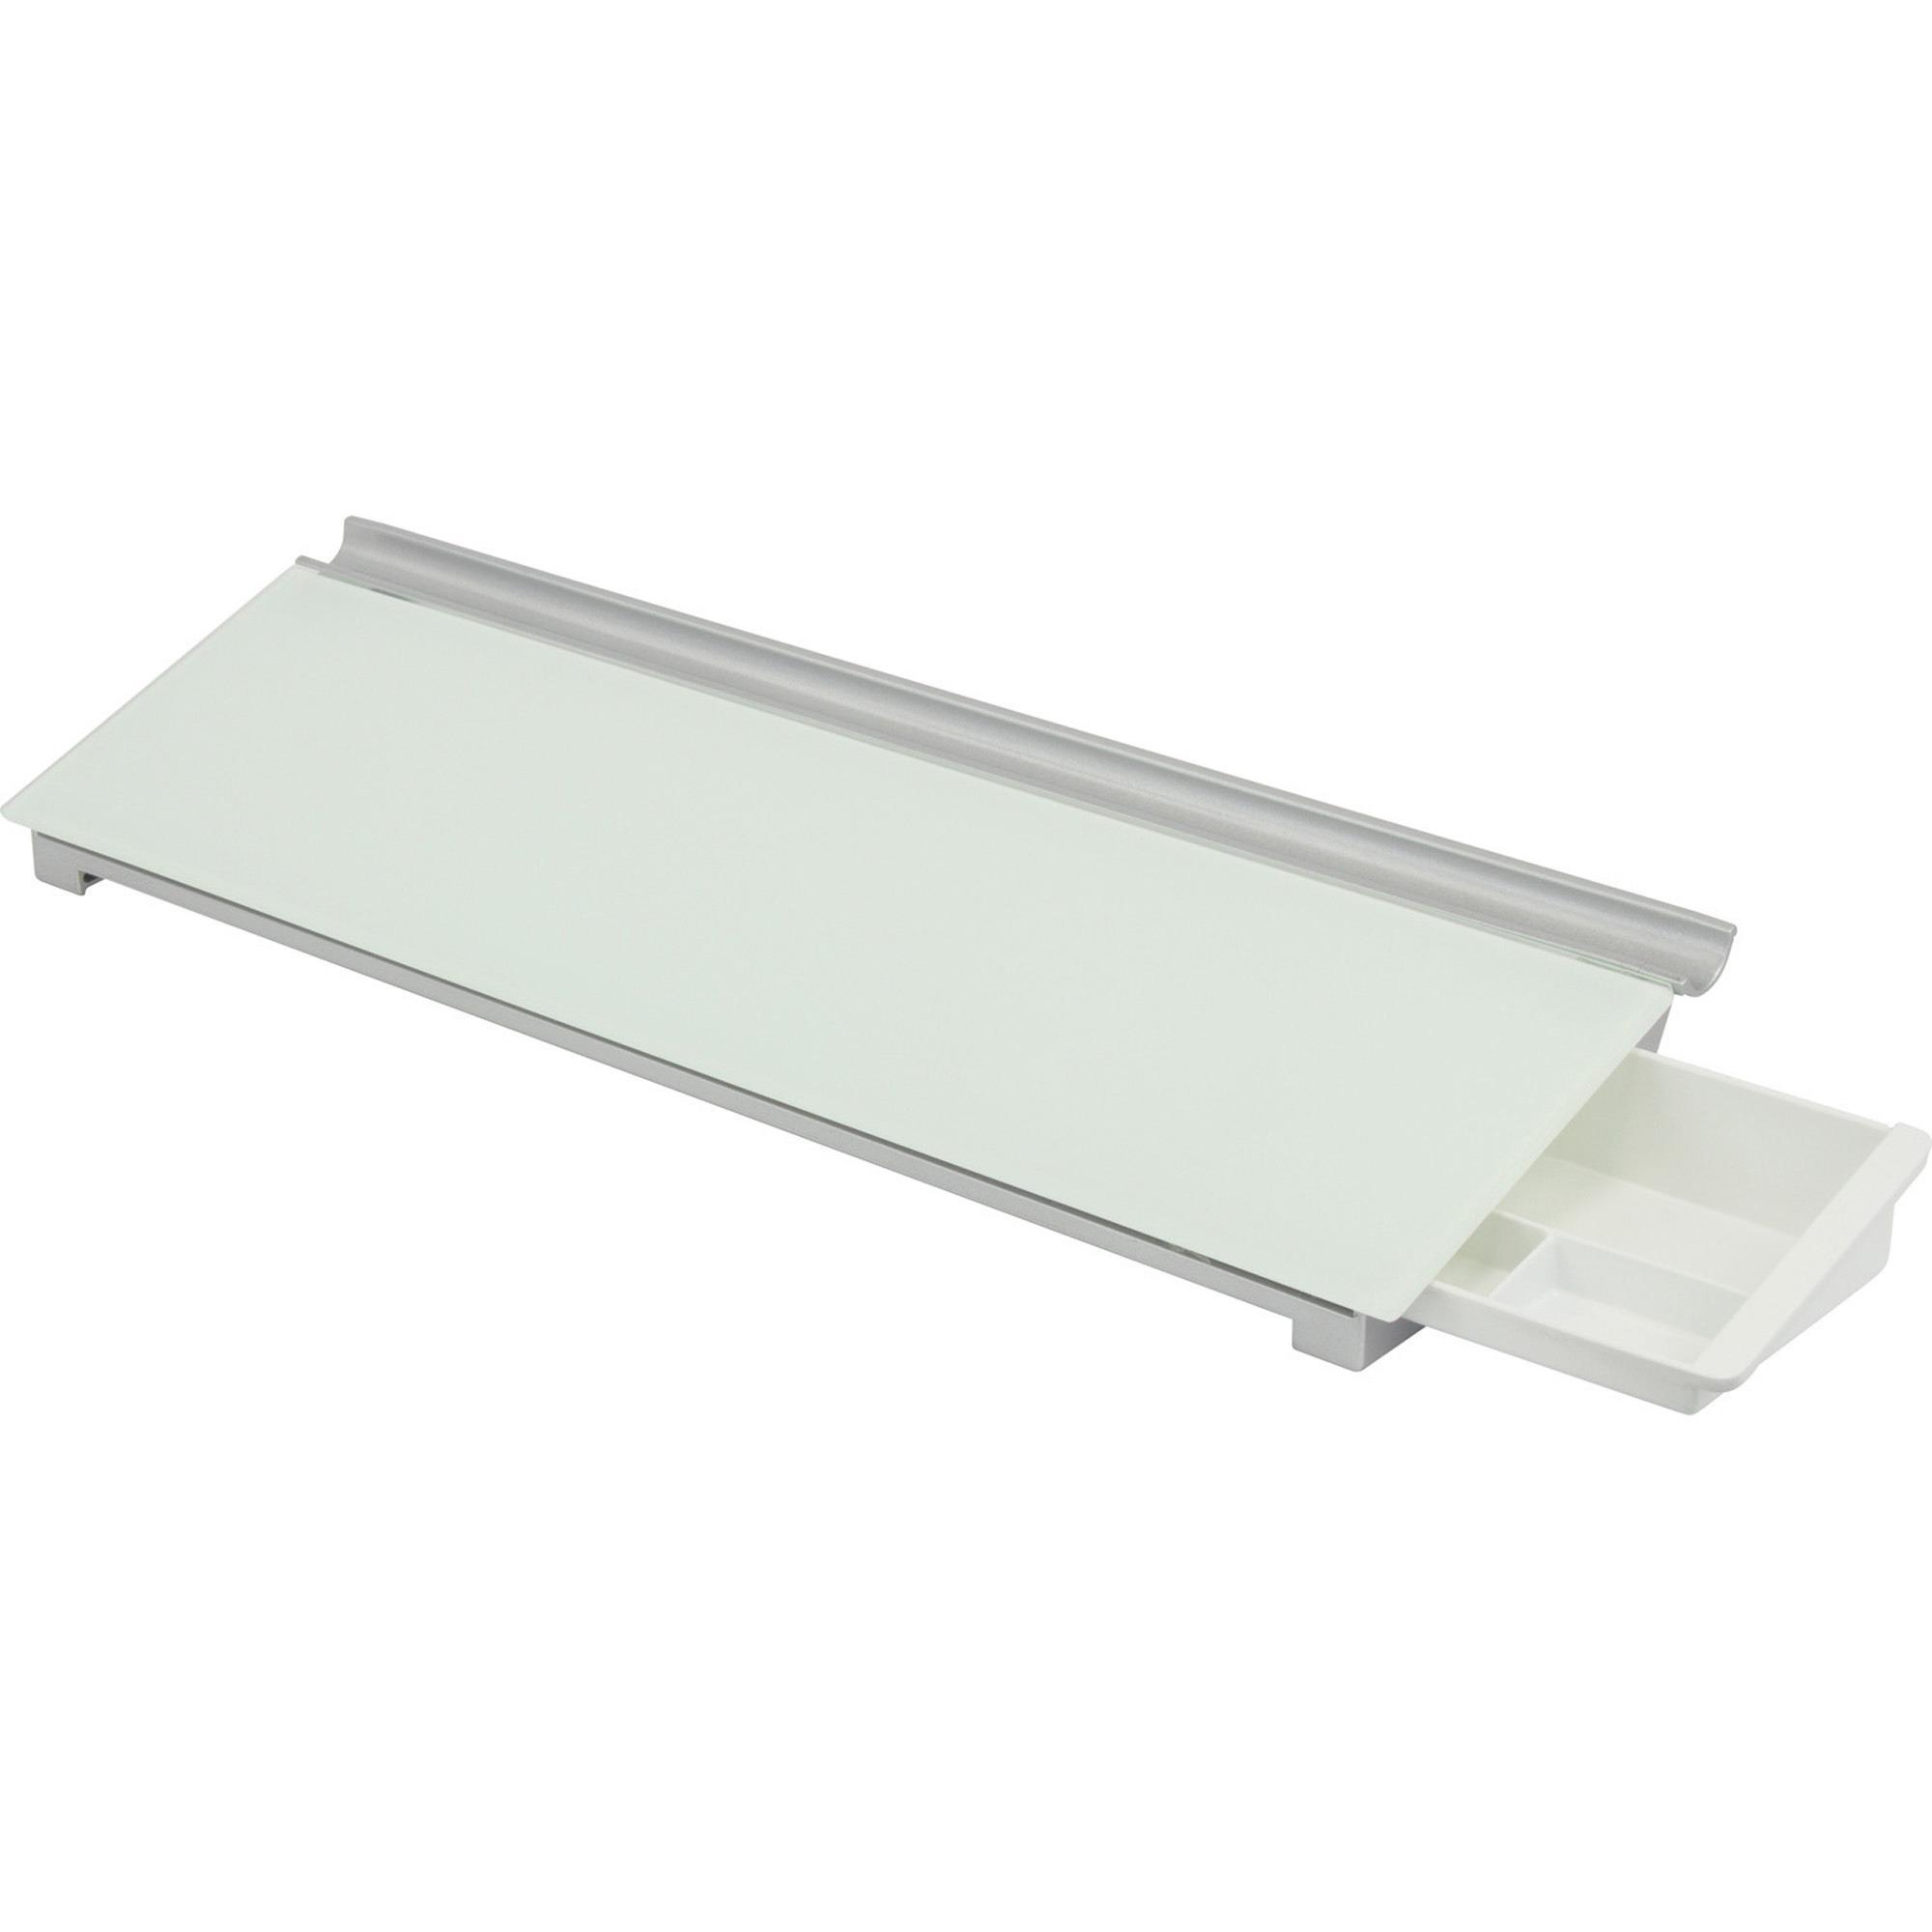 Desktop Dry Erase Board Easel Ayresmarcus